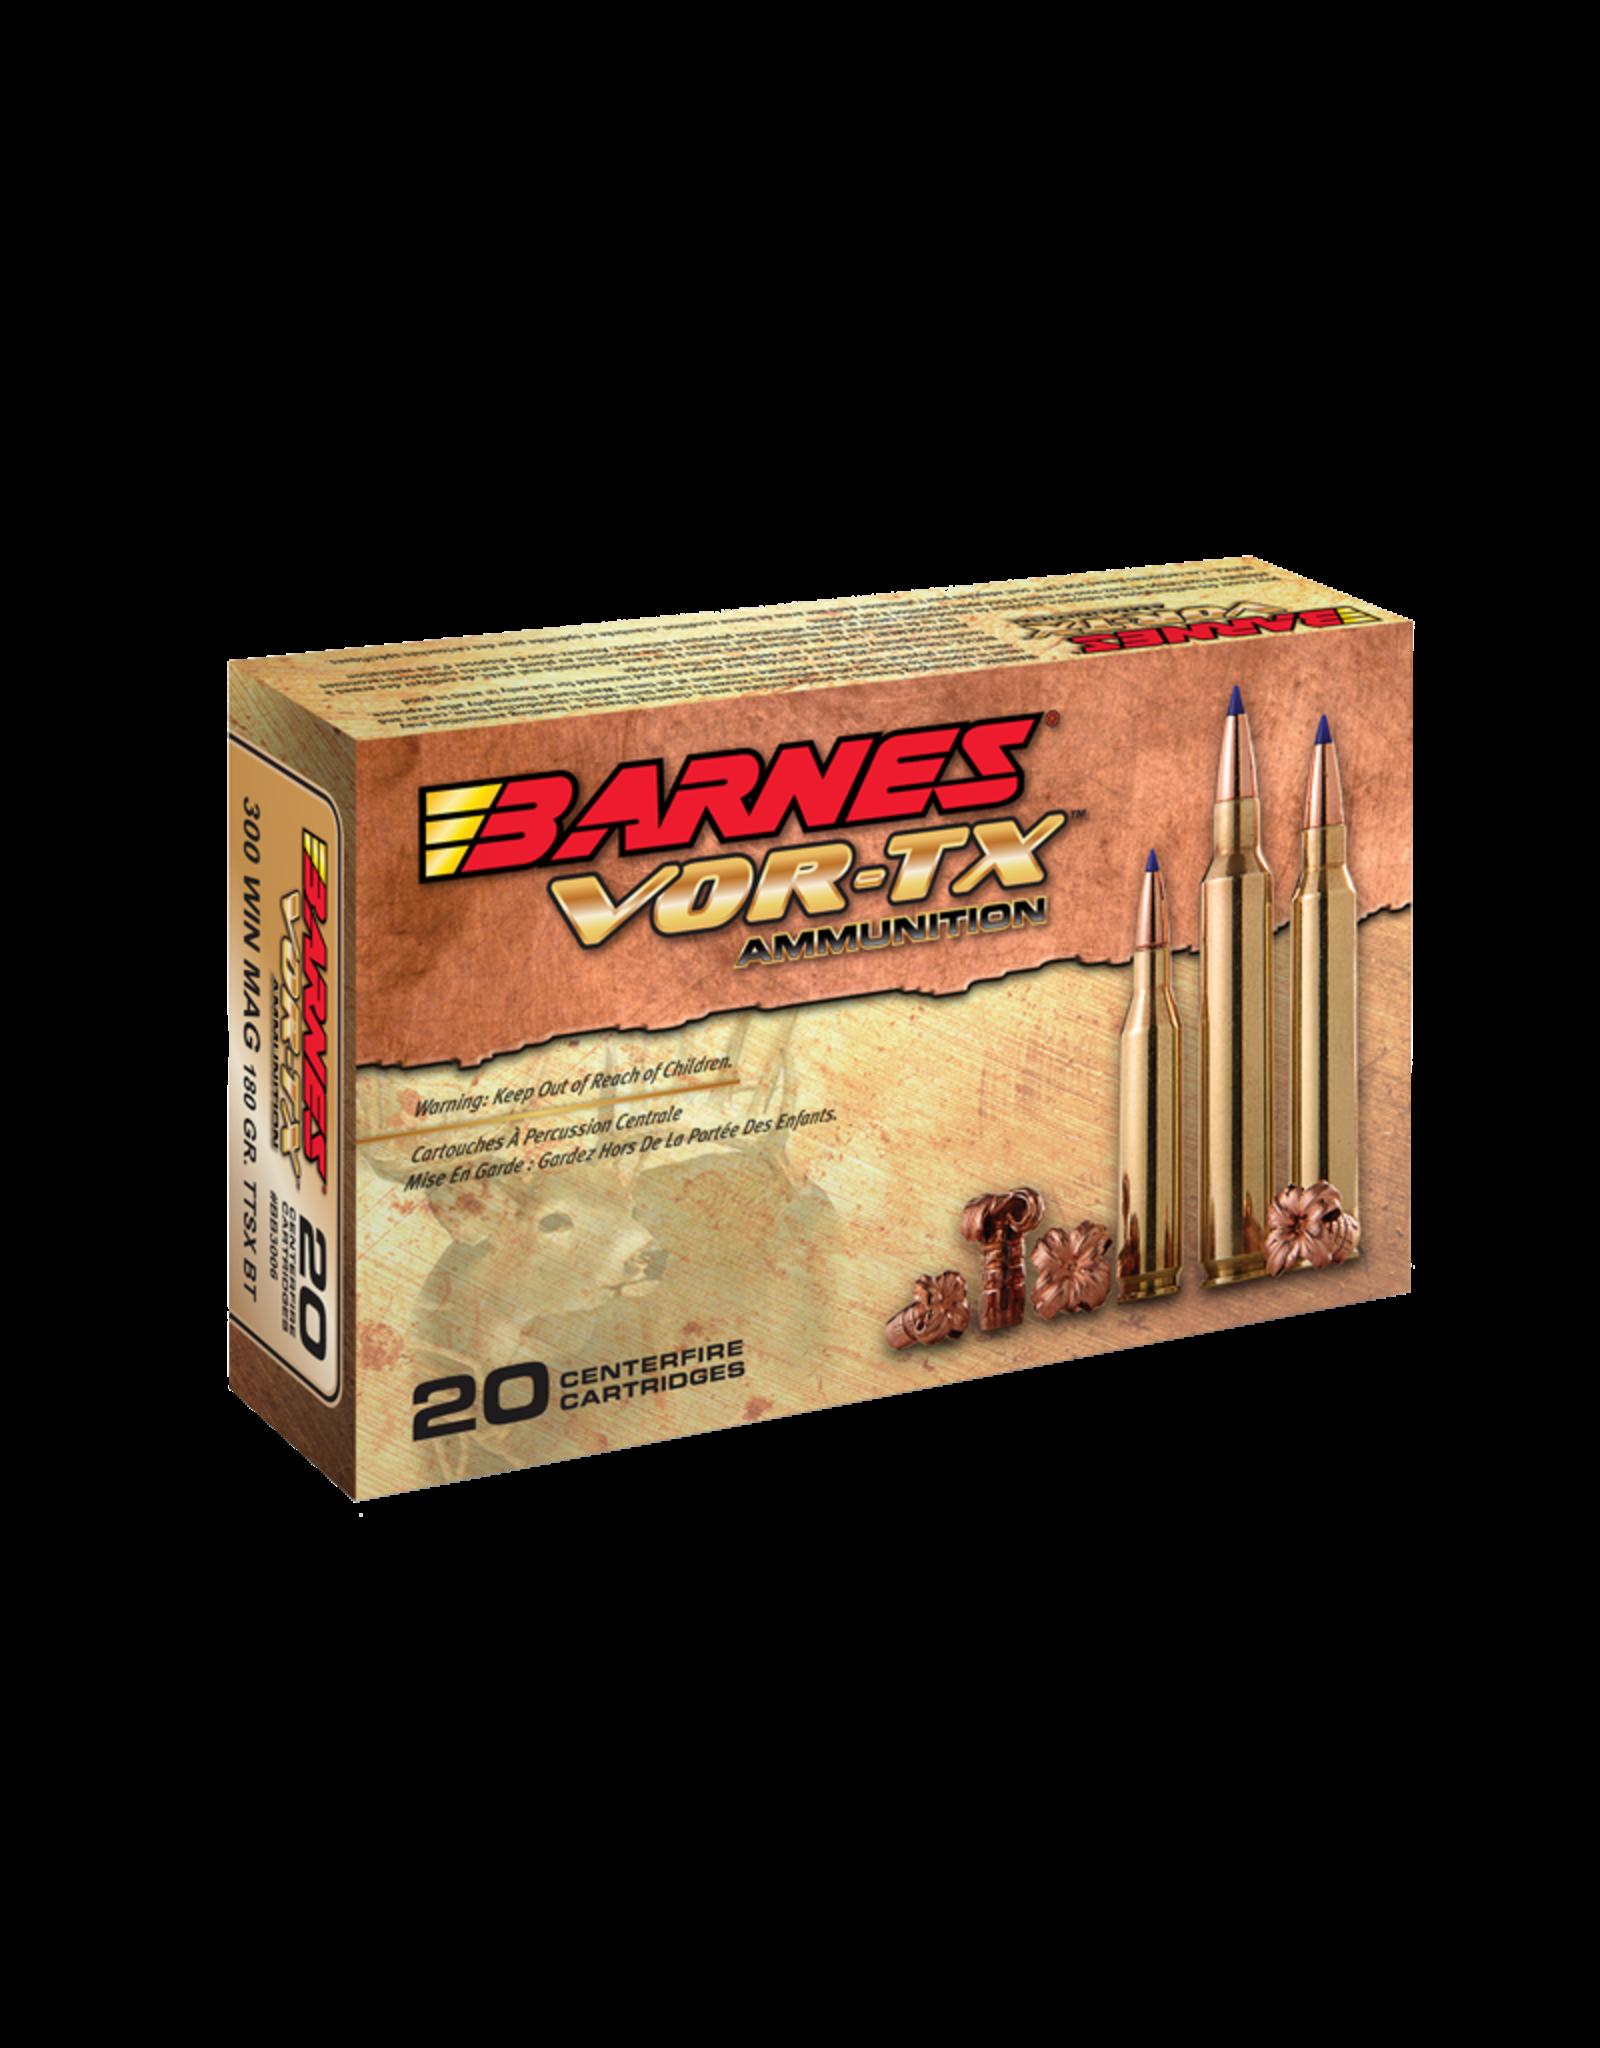 Barnes Barnes Vor-TX Rifle Ammo 30-06 SPR TTSX BT 180GR 20ct